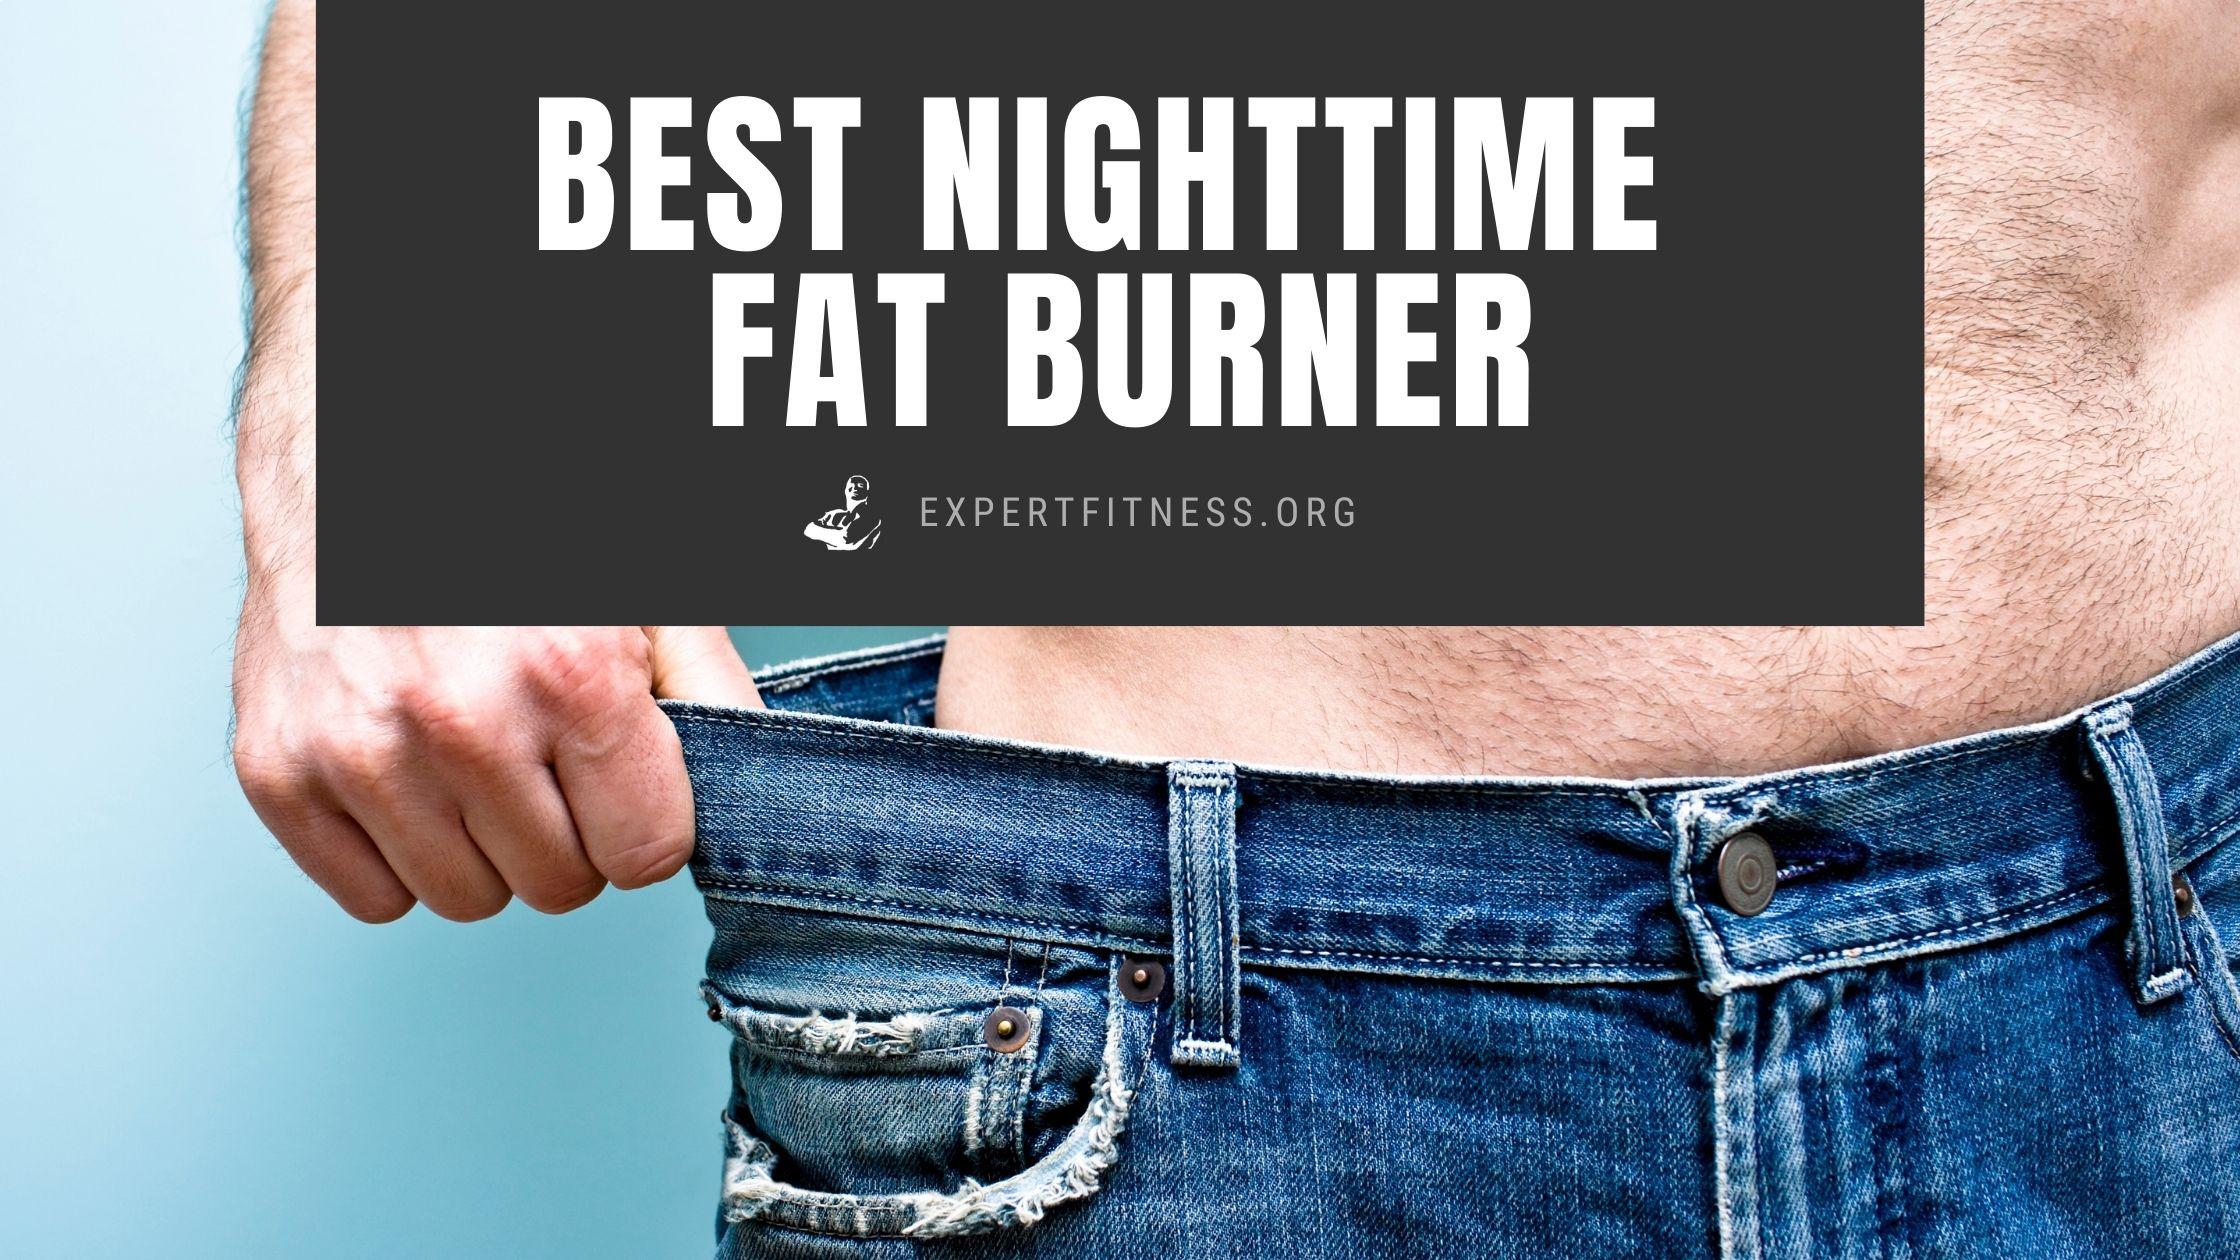 best nighttime fat burner